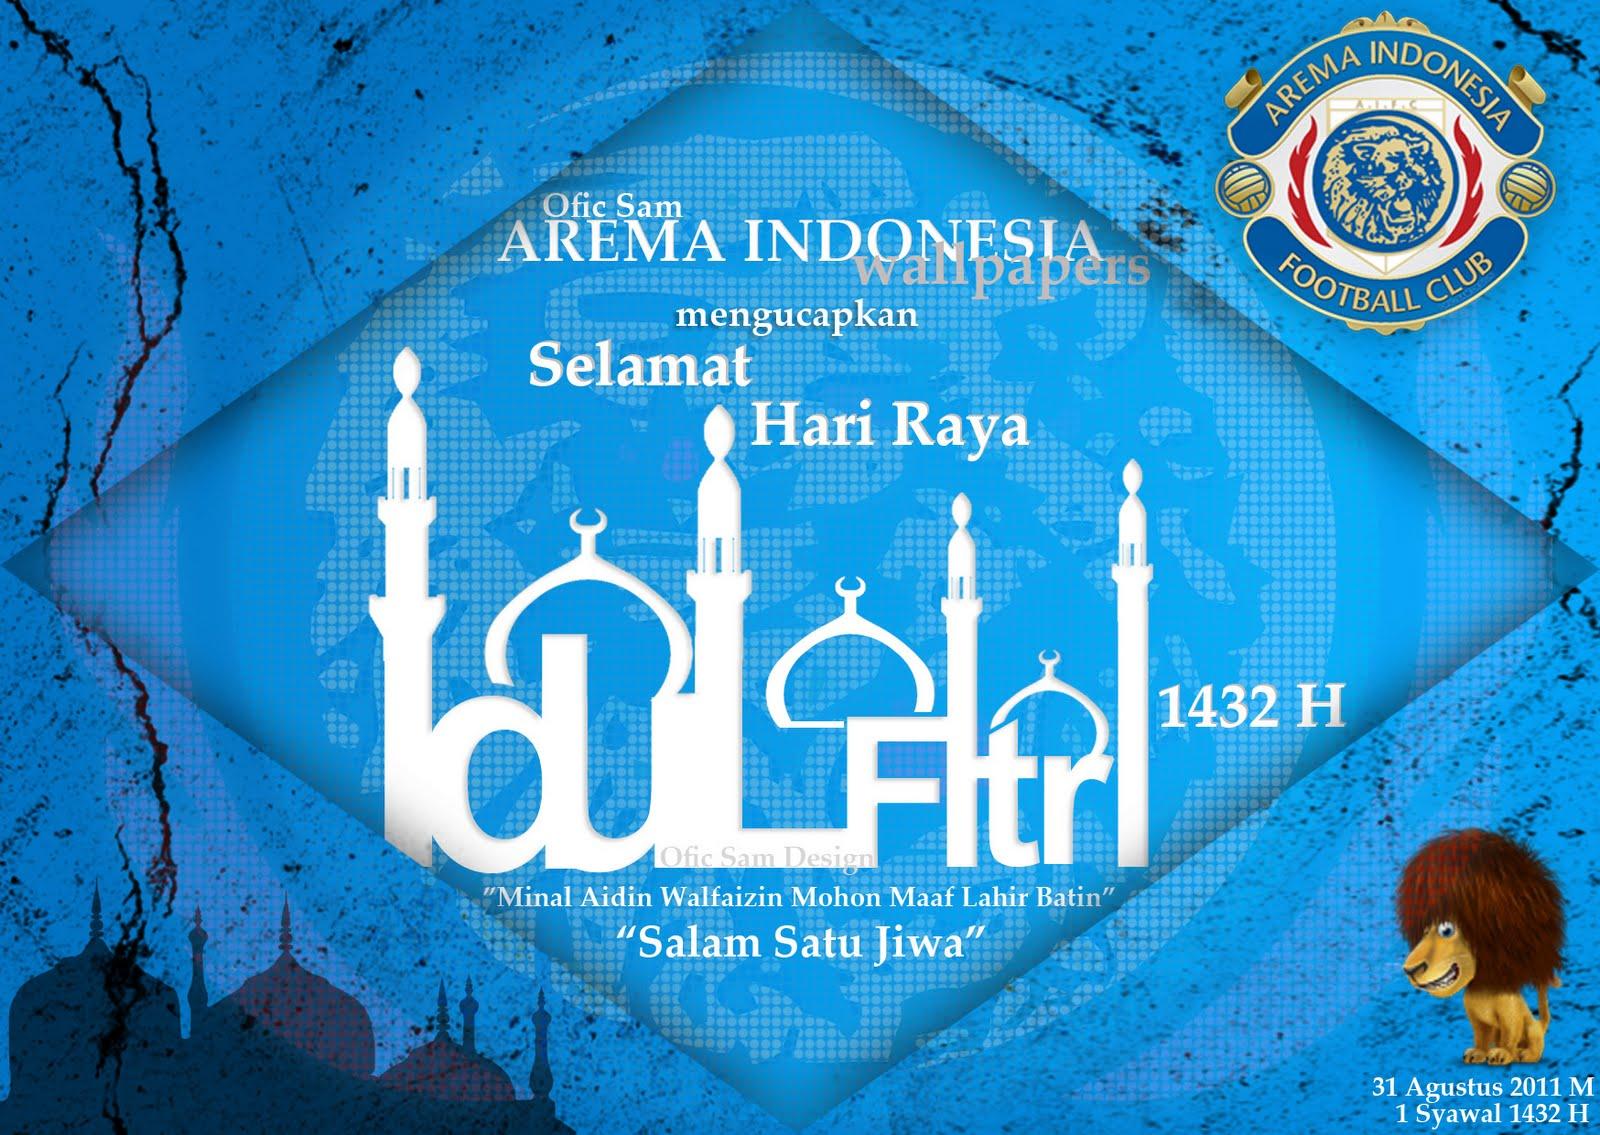 http://4.bp.blogspot.com/-UxcyWiSvQJ0/TmS3dsuS3xI/AAAAAAAAAhk/3BweE9KKR9A/s1600/Ofic+sam+design+-+partner+AREMA+INDONESIA+wallpapers.jpg